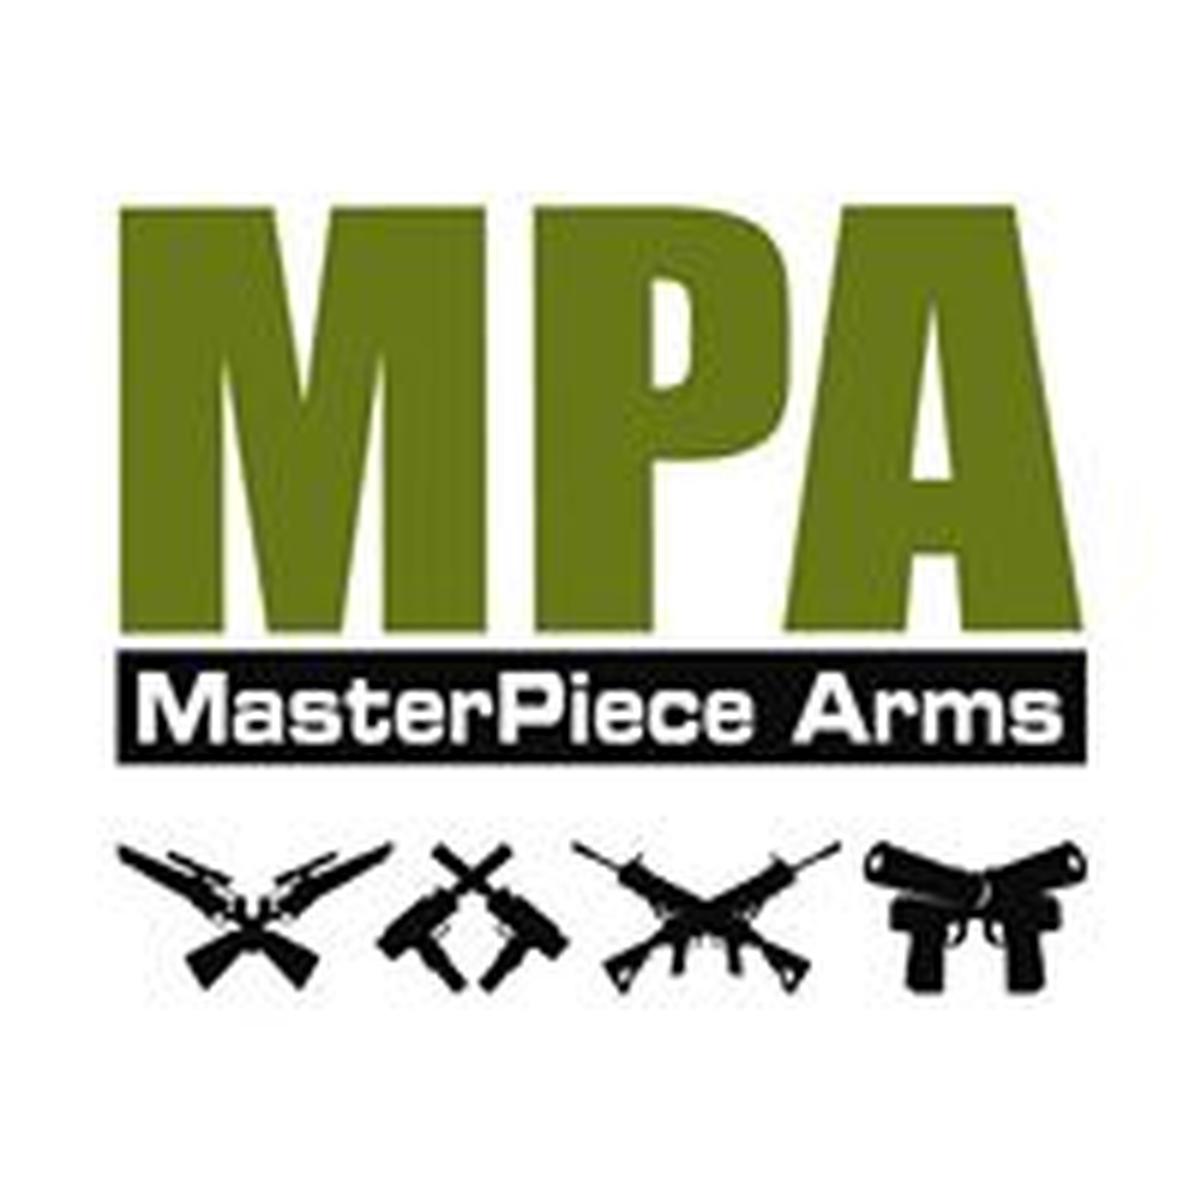 MasterPiece Arms (MPA) | Wiki | Everipedia